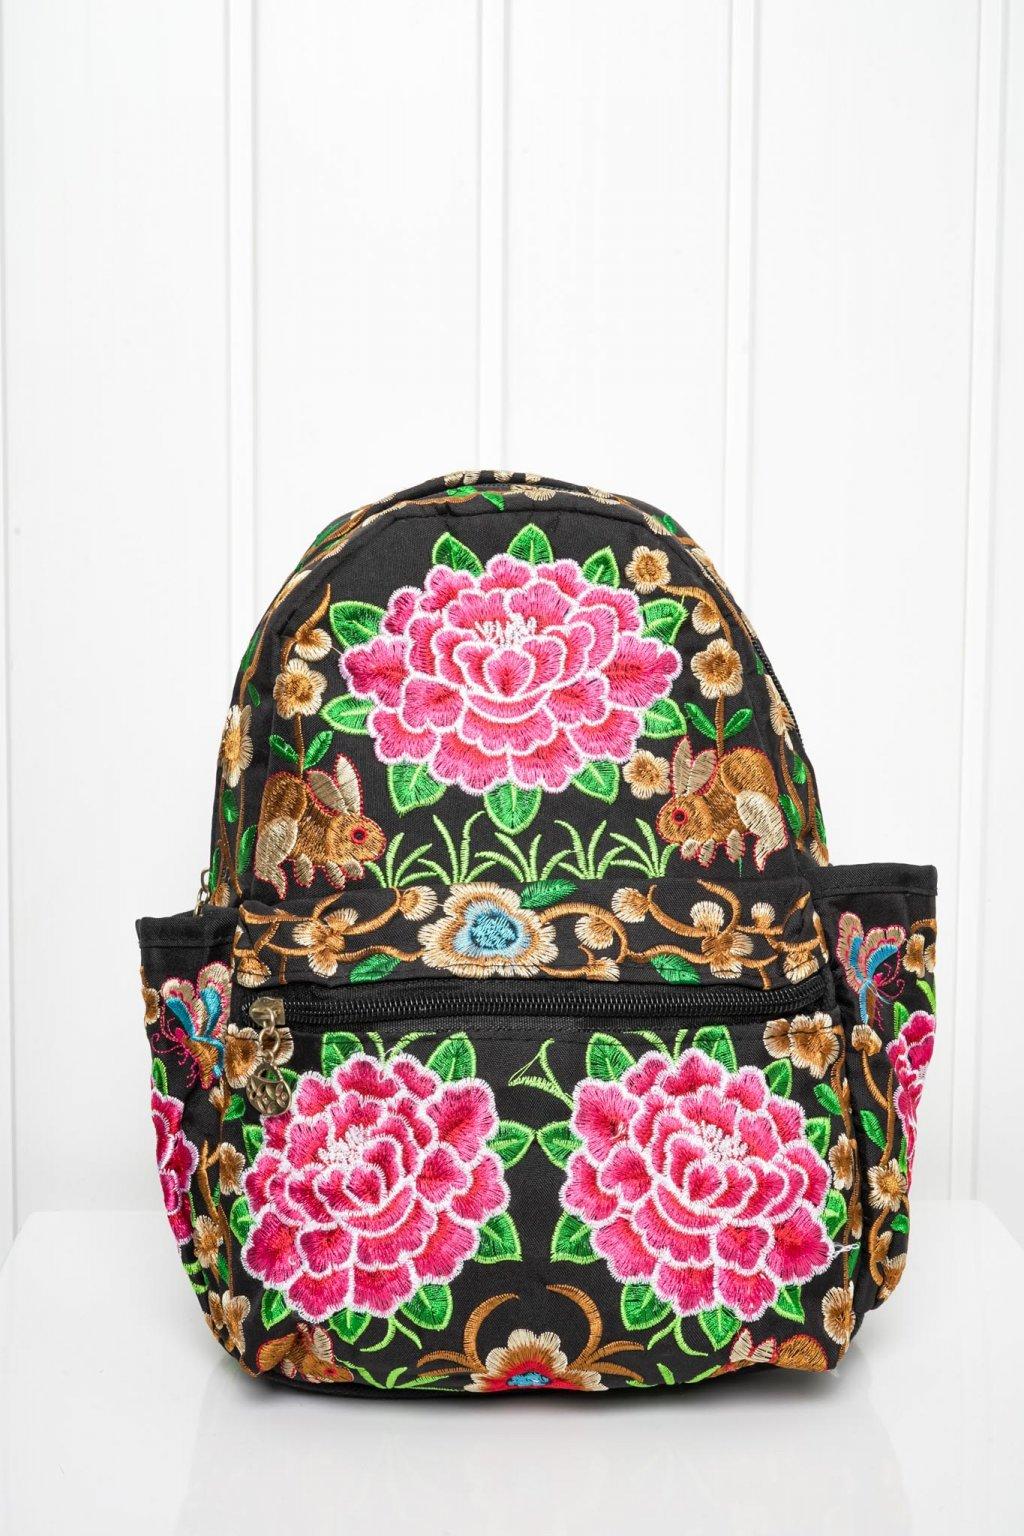 Kabelka, crossbody, ruksak, shopping bag, shopperka, 405